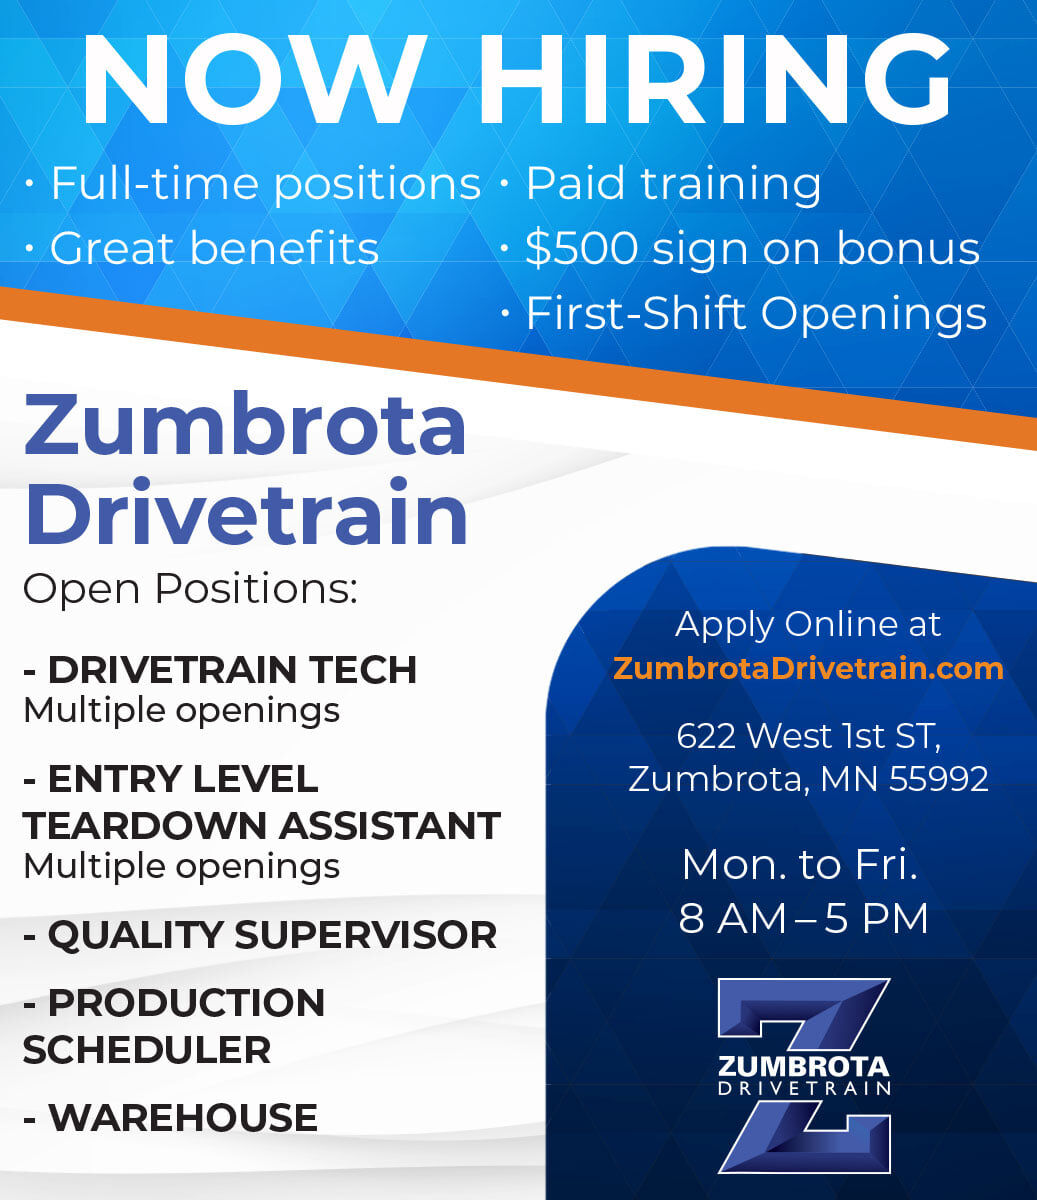 Zumbrota Drivetrain hiring